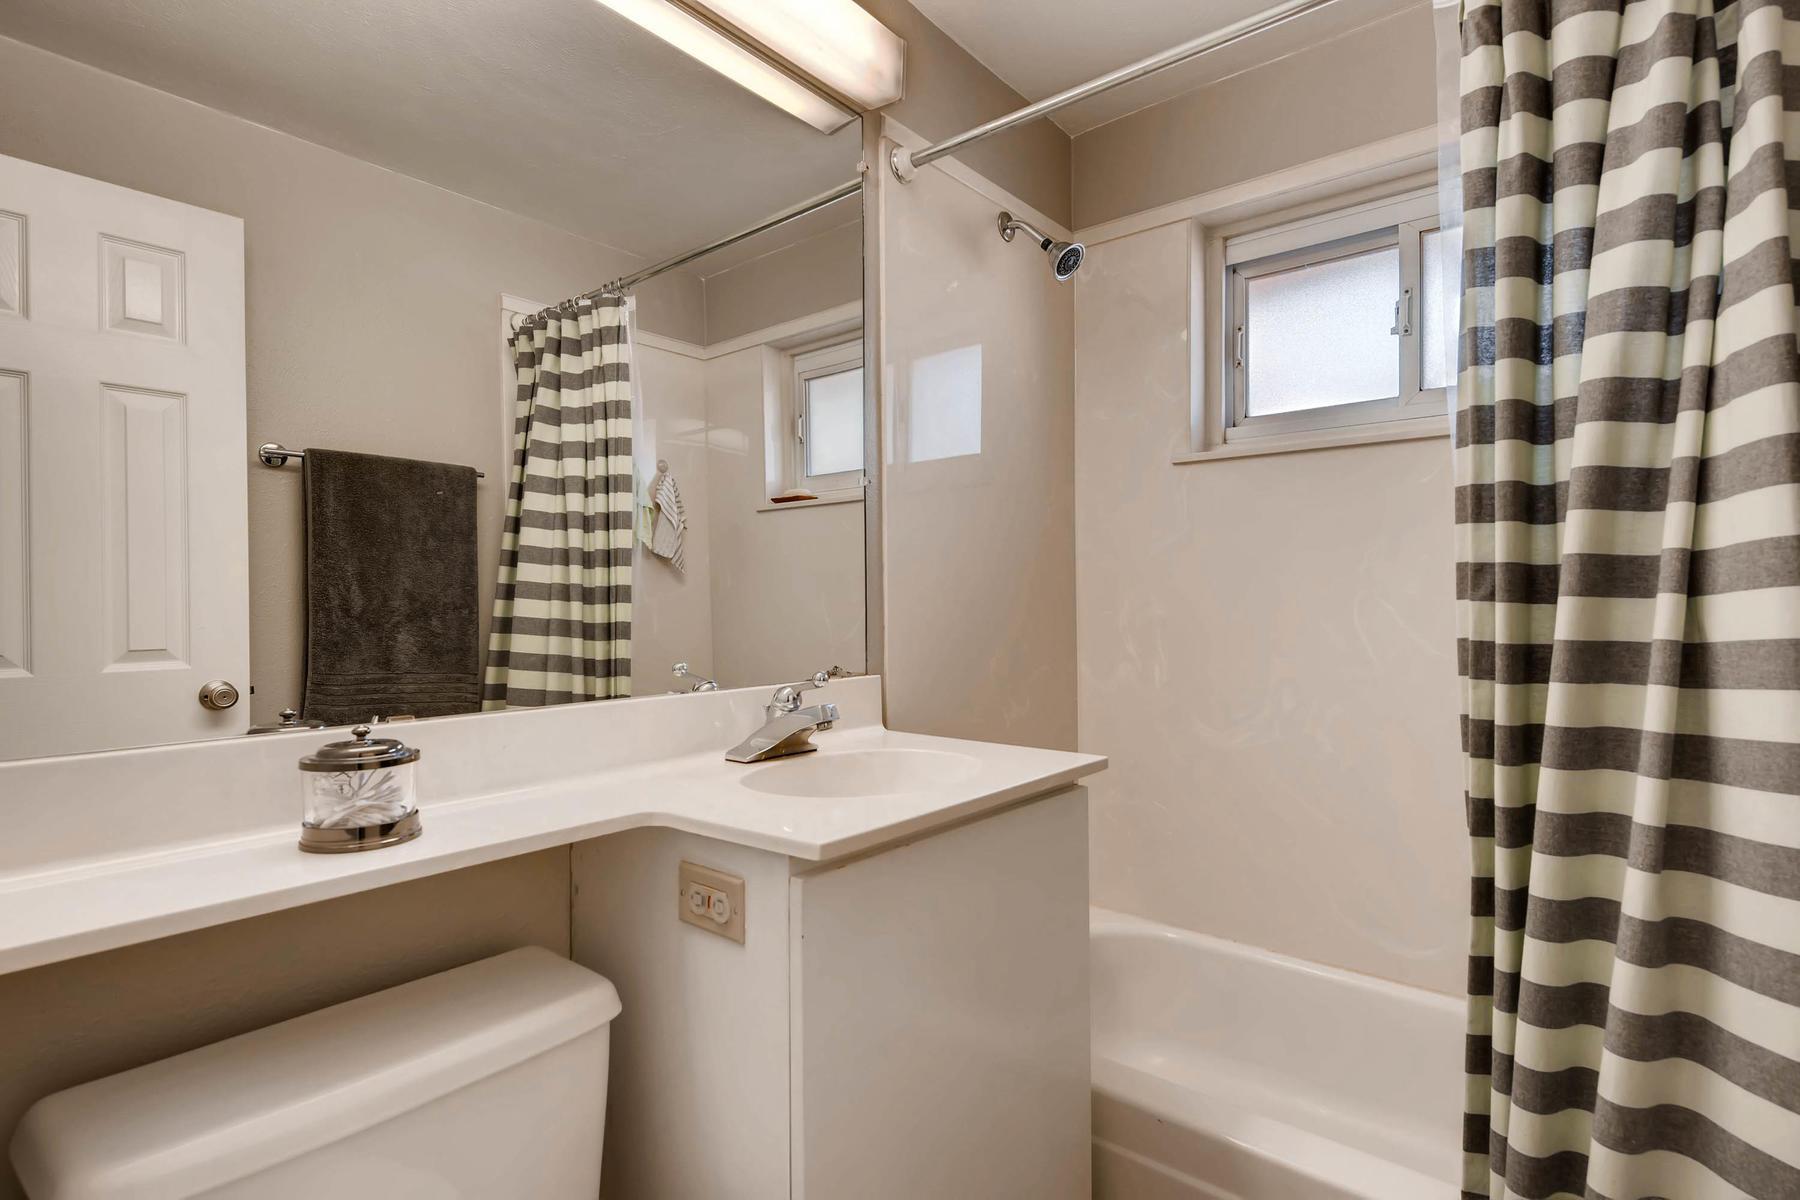 6676 S Kit Carson St-MLS_Size-018-20-Bathroom-1800x1200-72dpi.jpg